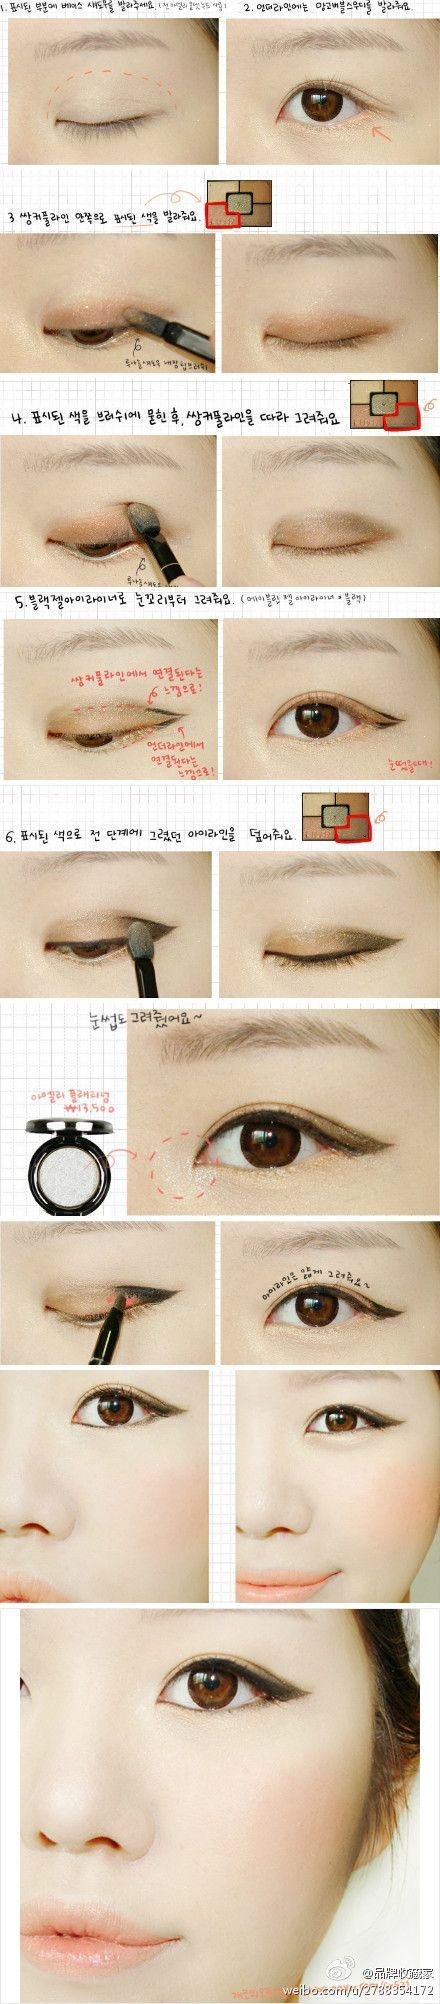 11 tips para tener un maquillaje asitico perfecto asian eye 11 tips para tener un maquillaje asitico perfecto korean makeup tutorialskorean baditri Image collections